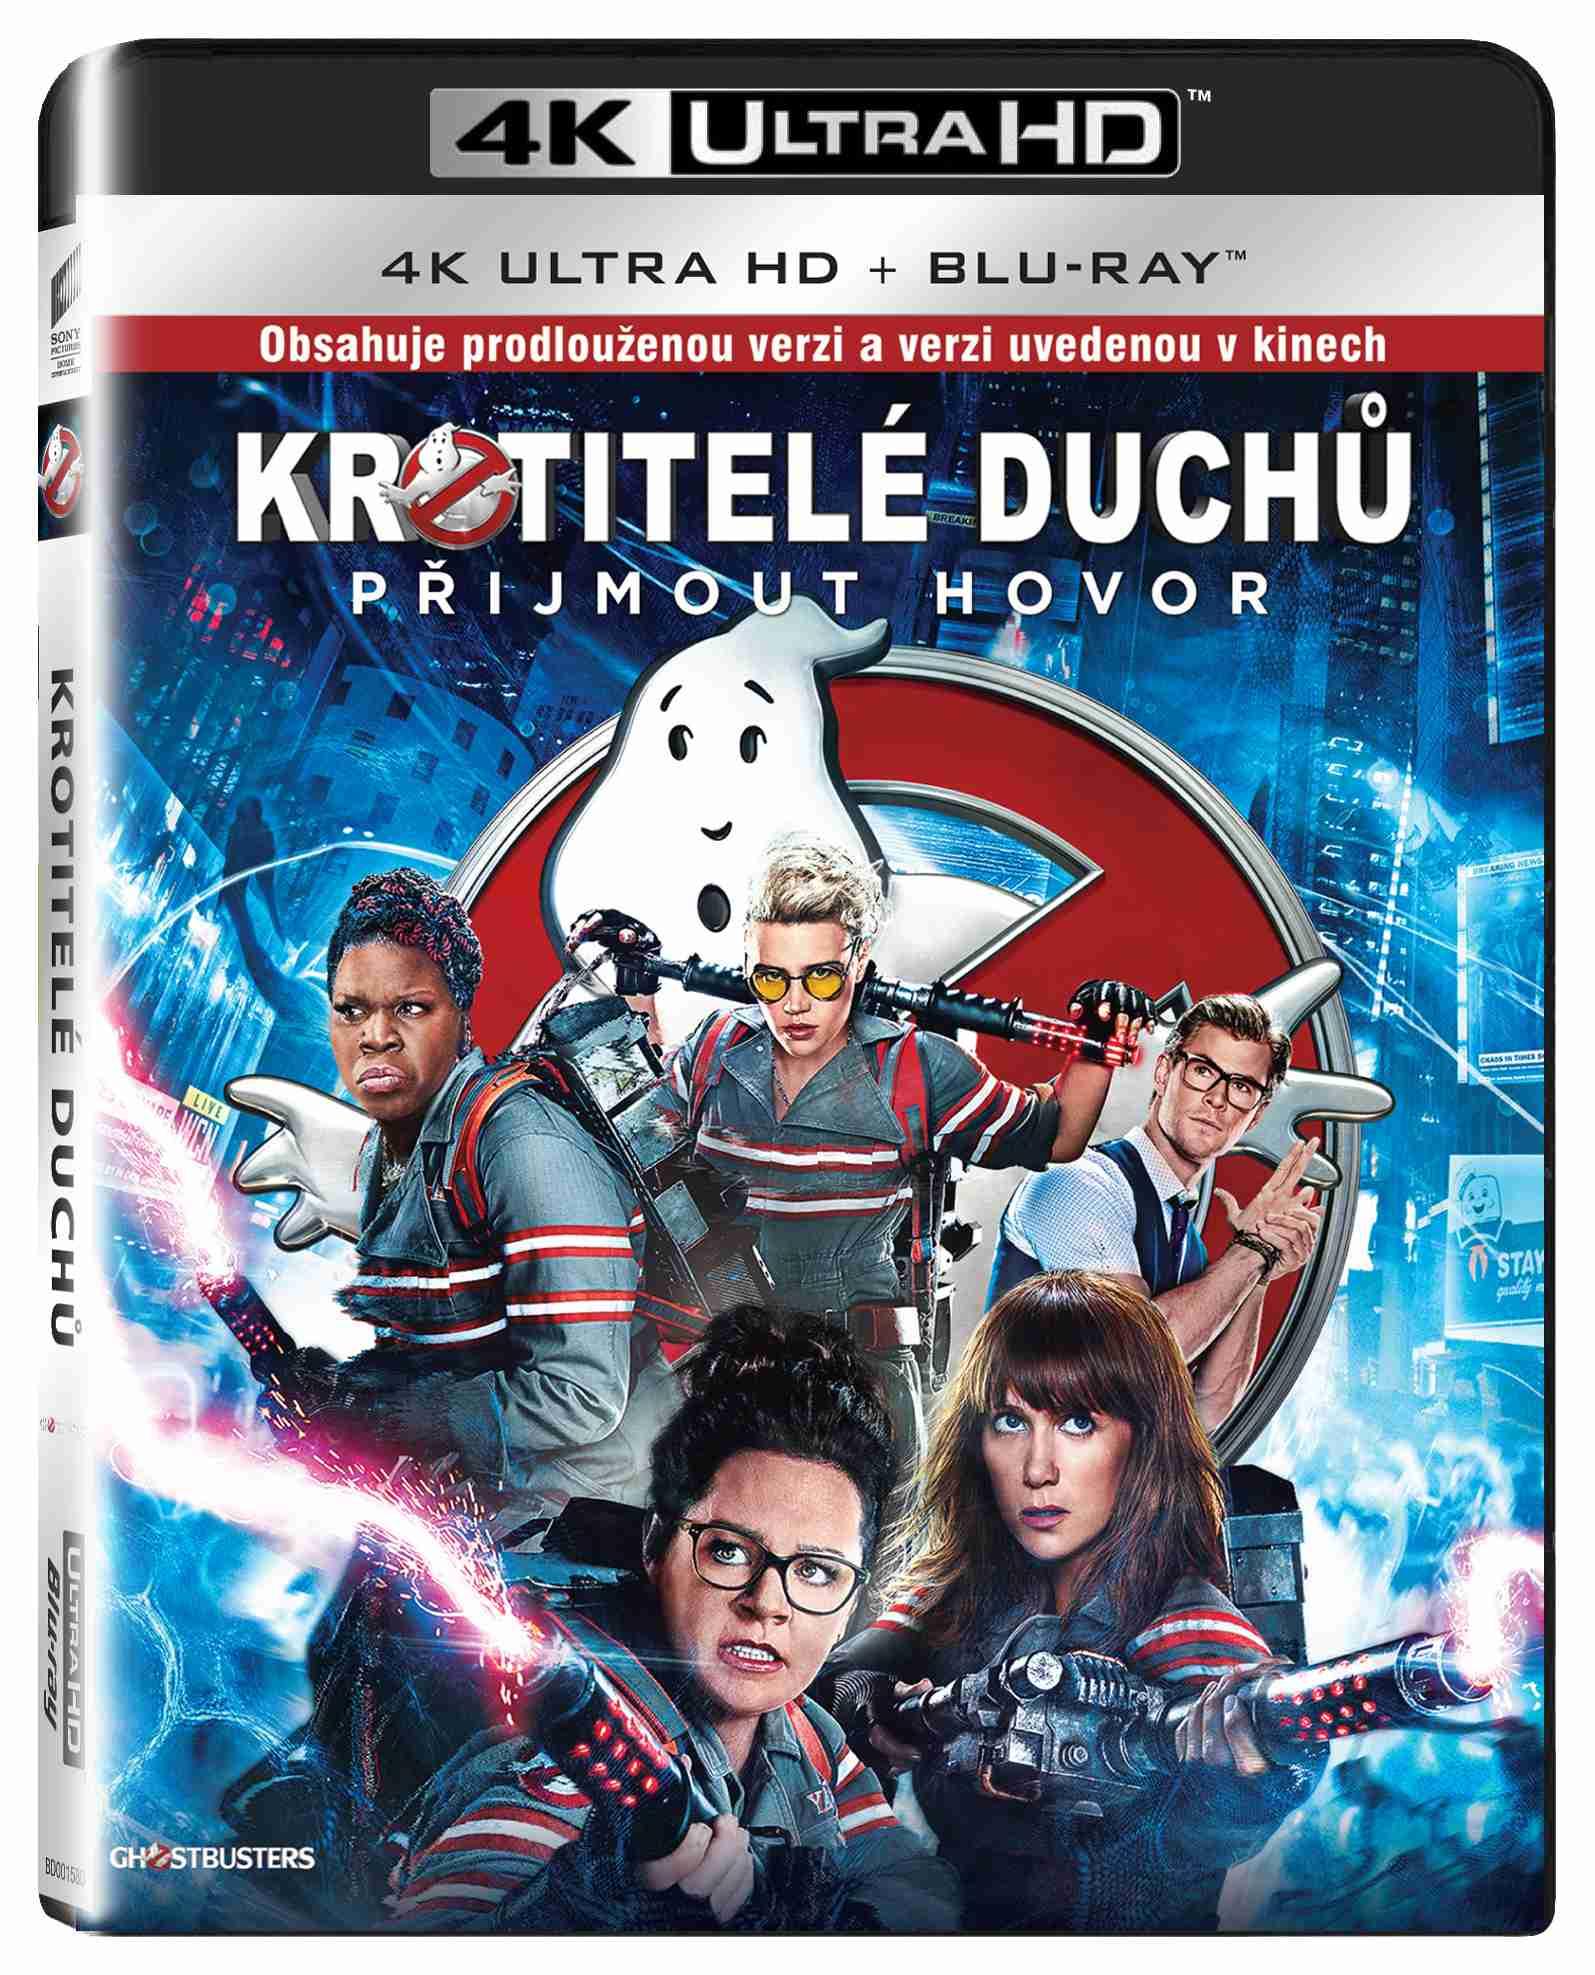 KROTITELÉ DUCHŮ (2016) 4K ULTRA HD - UHD Blu-ray + Blu-ray (2 BD)